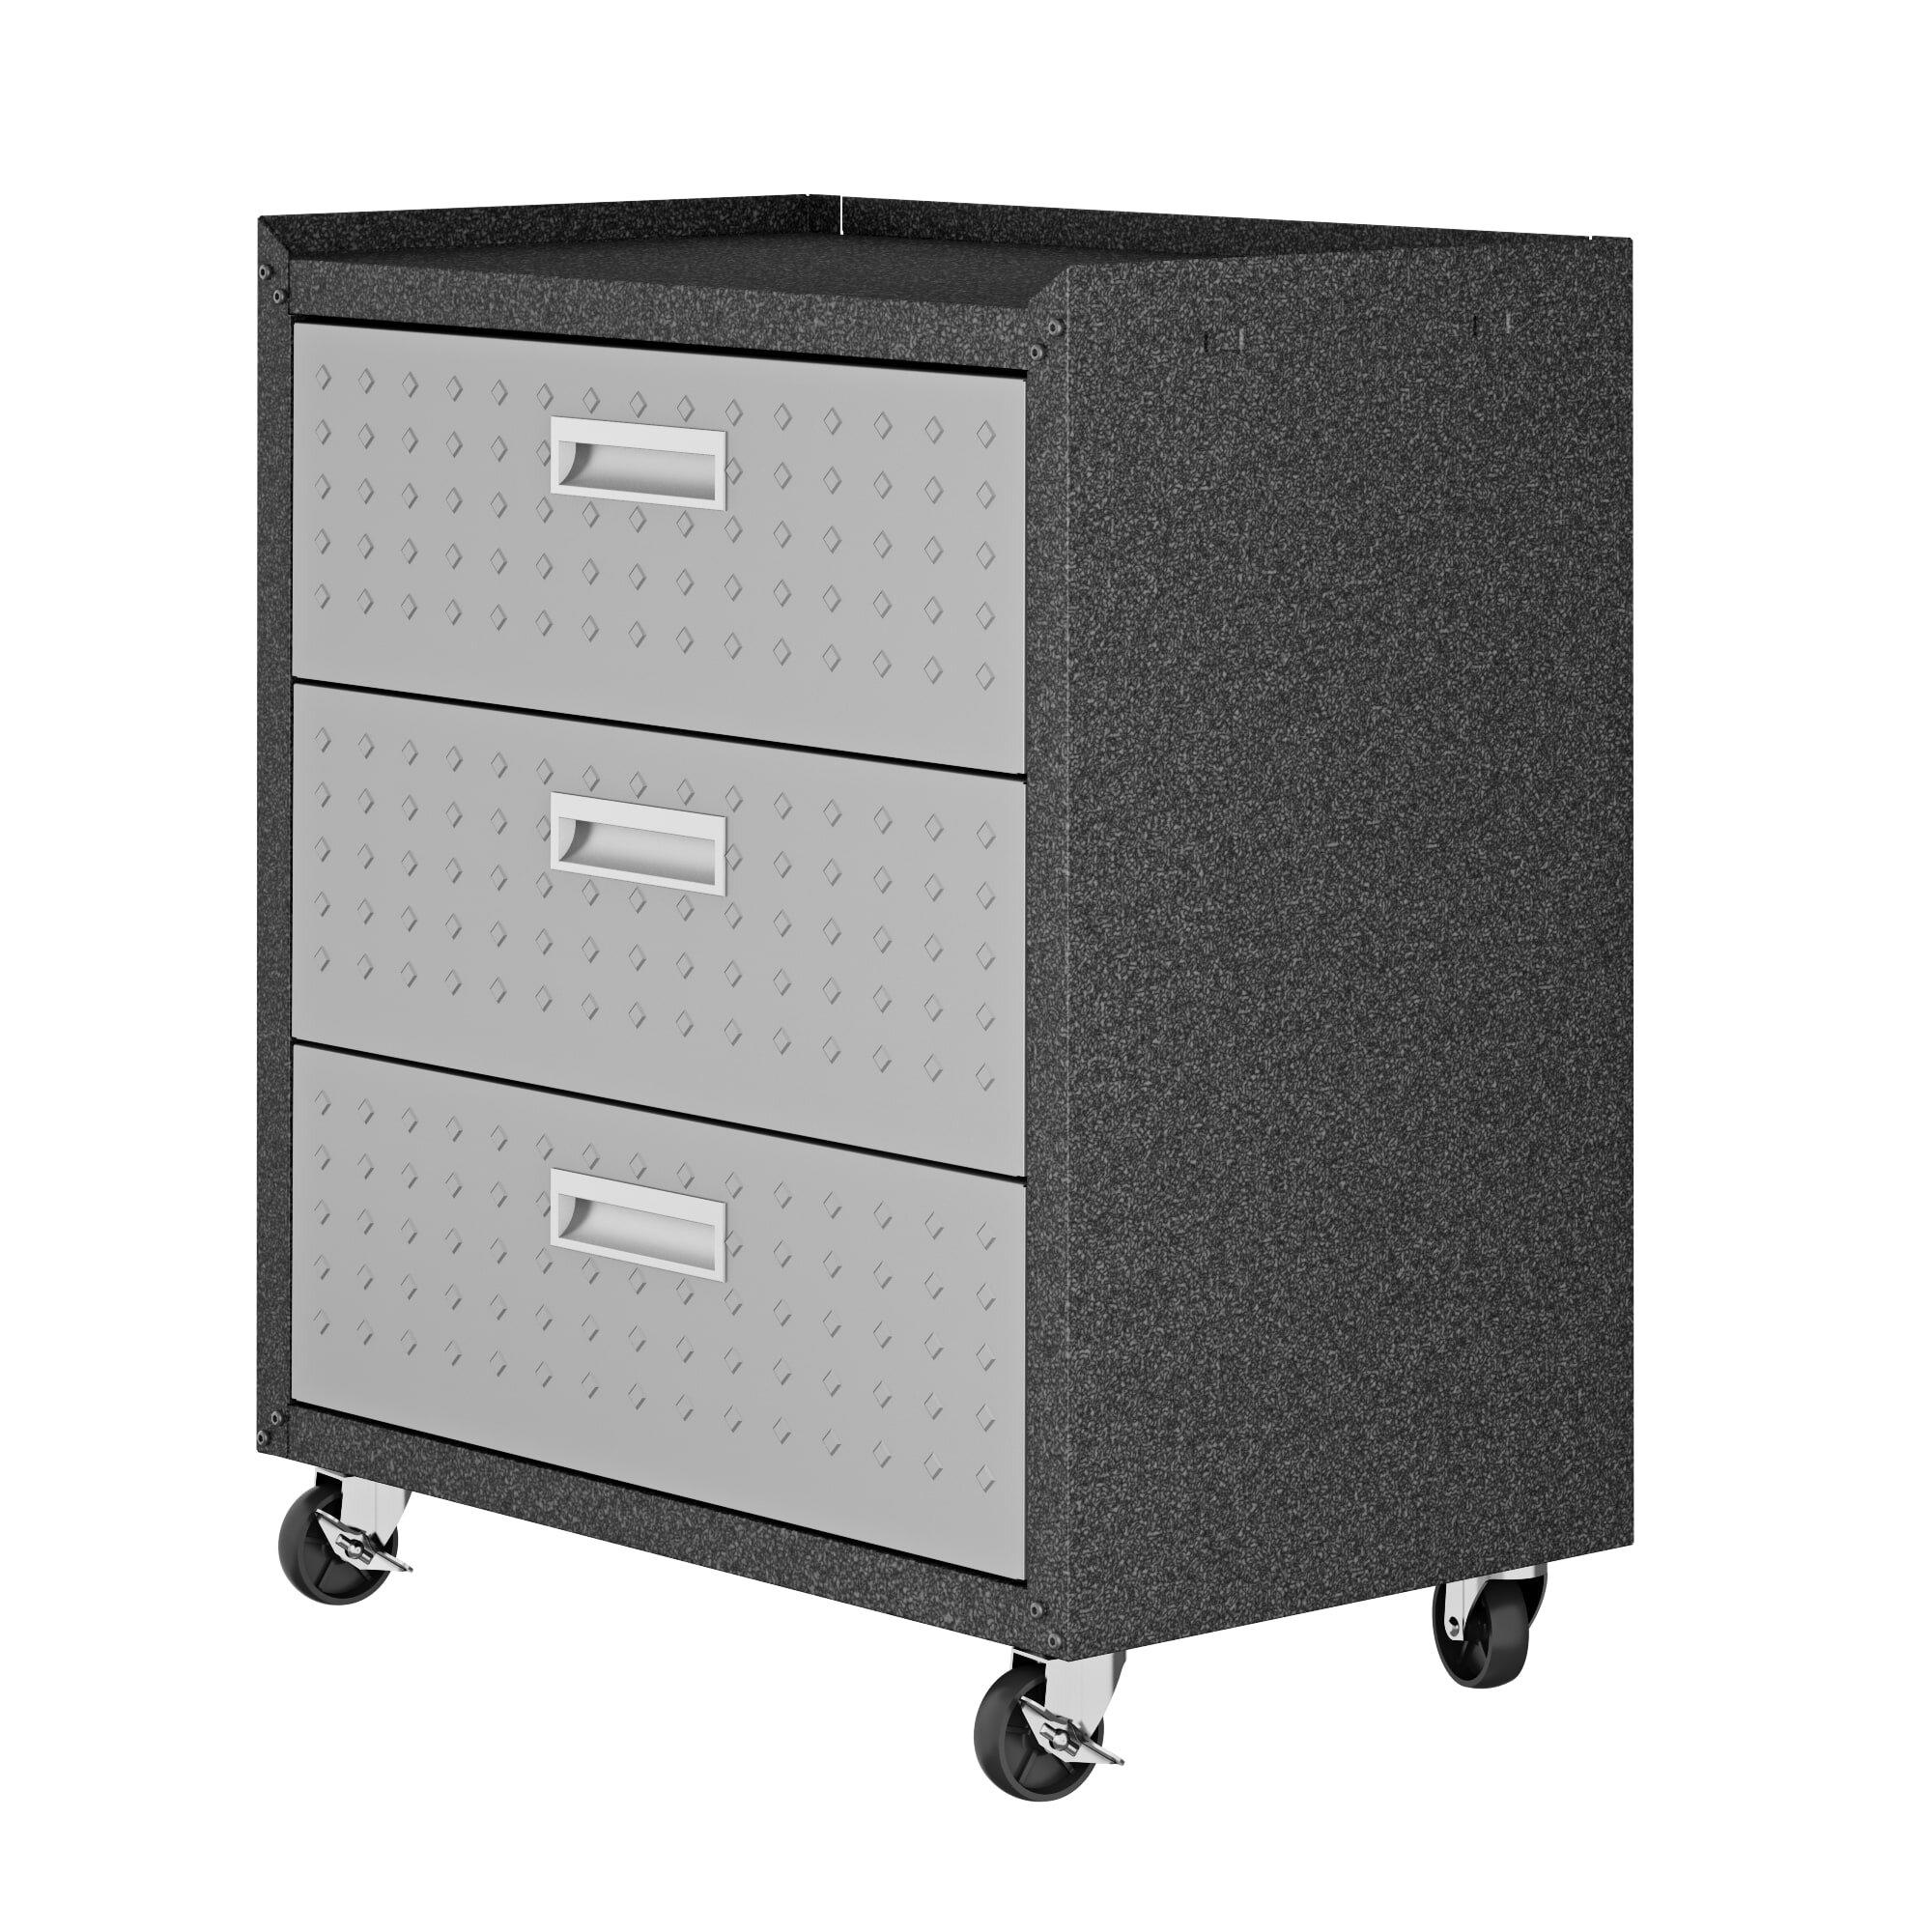 Fortress 32 H X 30 W X 18 D Garage Mobile Storage Cabinet